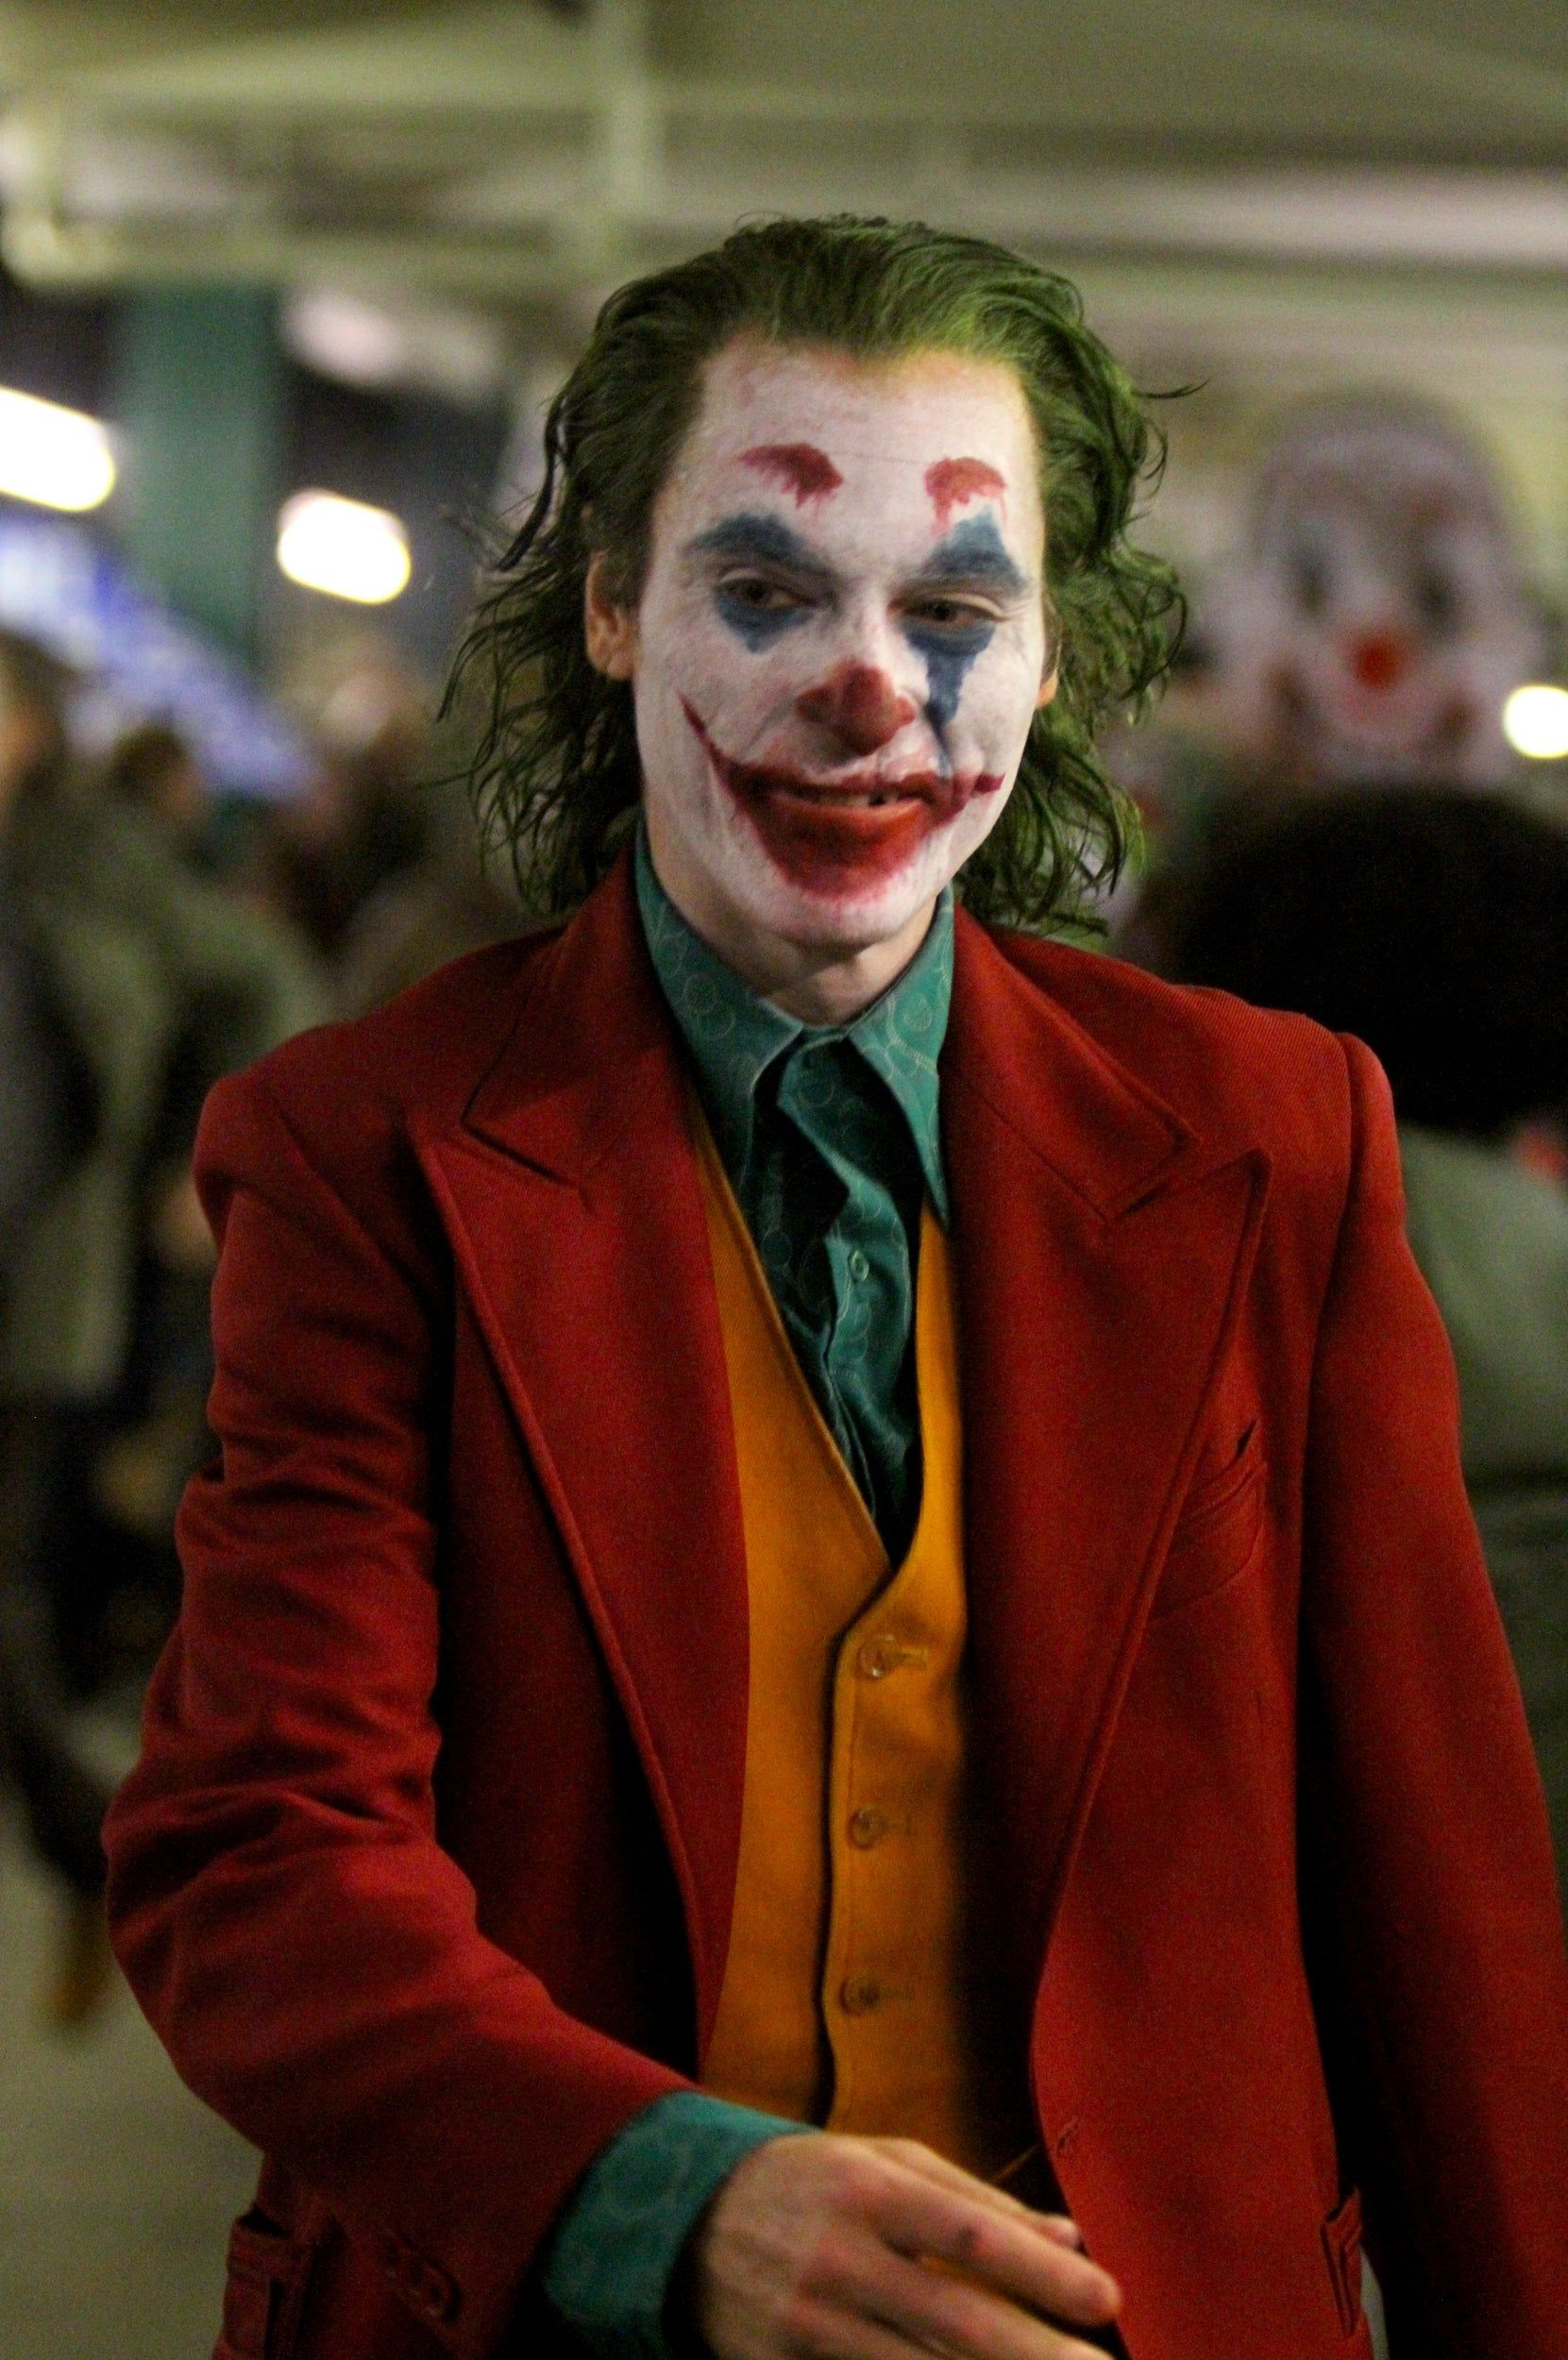 Final Week Two Or Five Odeon Cinema Tickets Available Nationwide No Booking Fee Joker Costume Joker Joker Pics